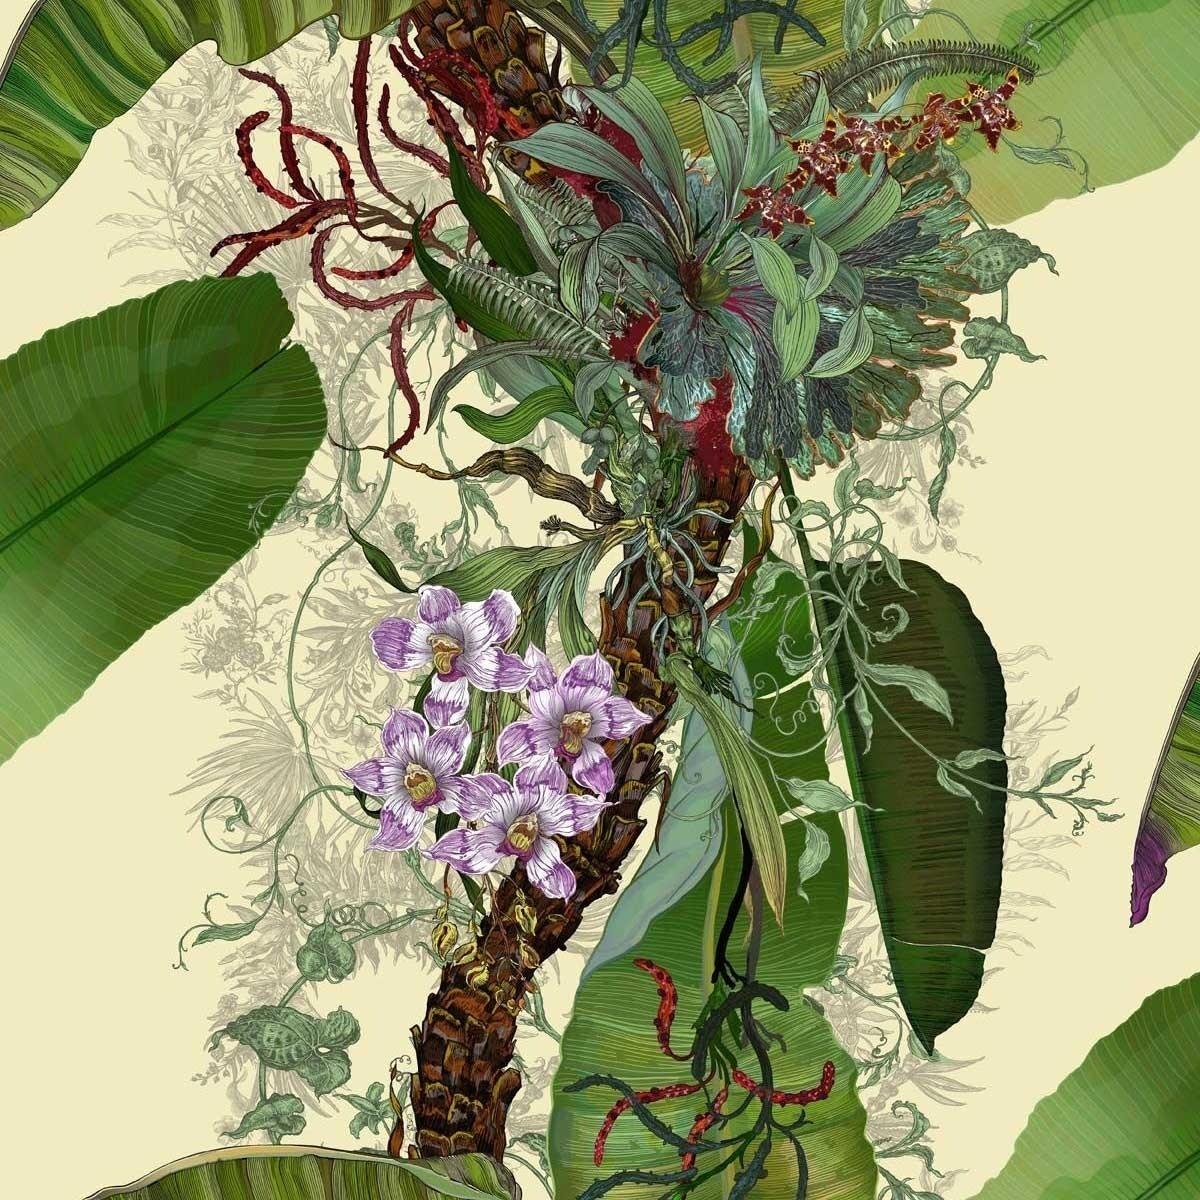 Papier Peint Tropical Tropical Grande Largeur Timorous Beasties